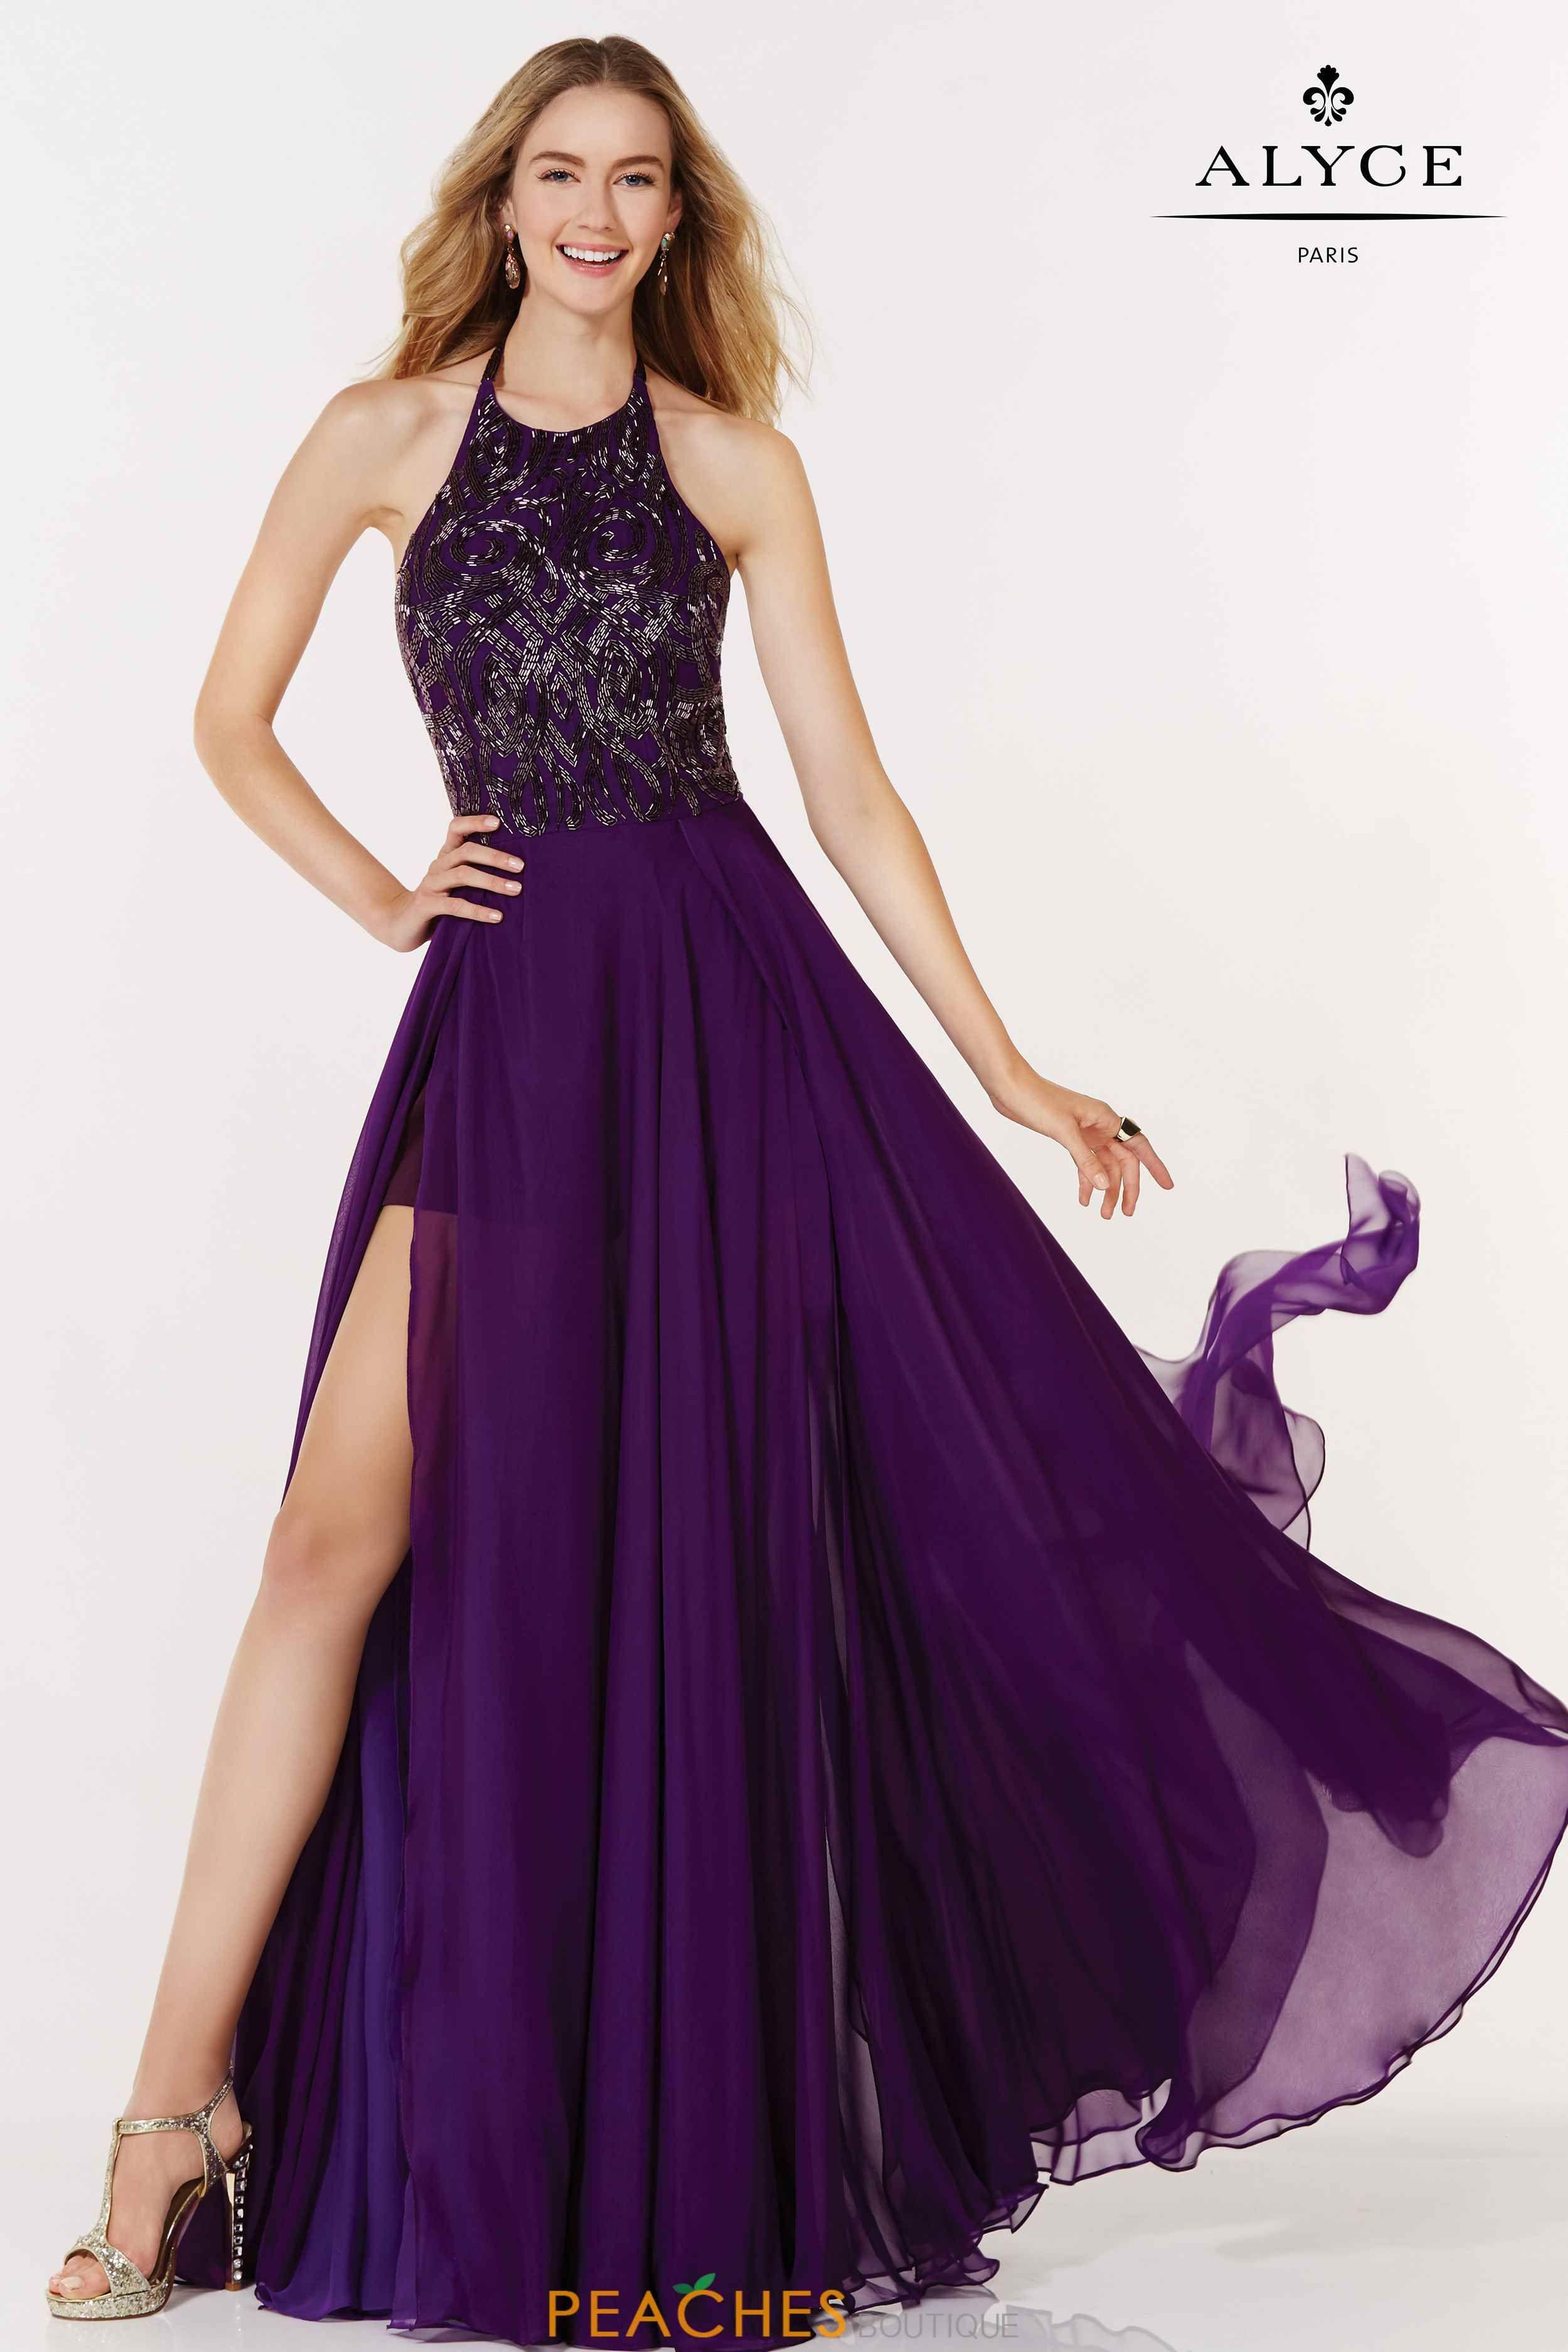 Alyce Prom Dresses Peaches Boutique Dark Purple Prom Dresses Purple Prom Dress Purple Prom Dress Long Dark [ 3750 x 2500 Pixel ]